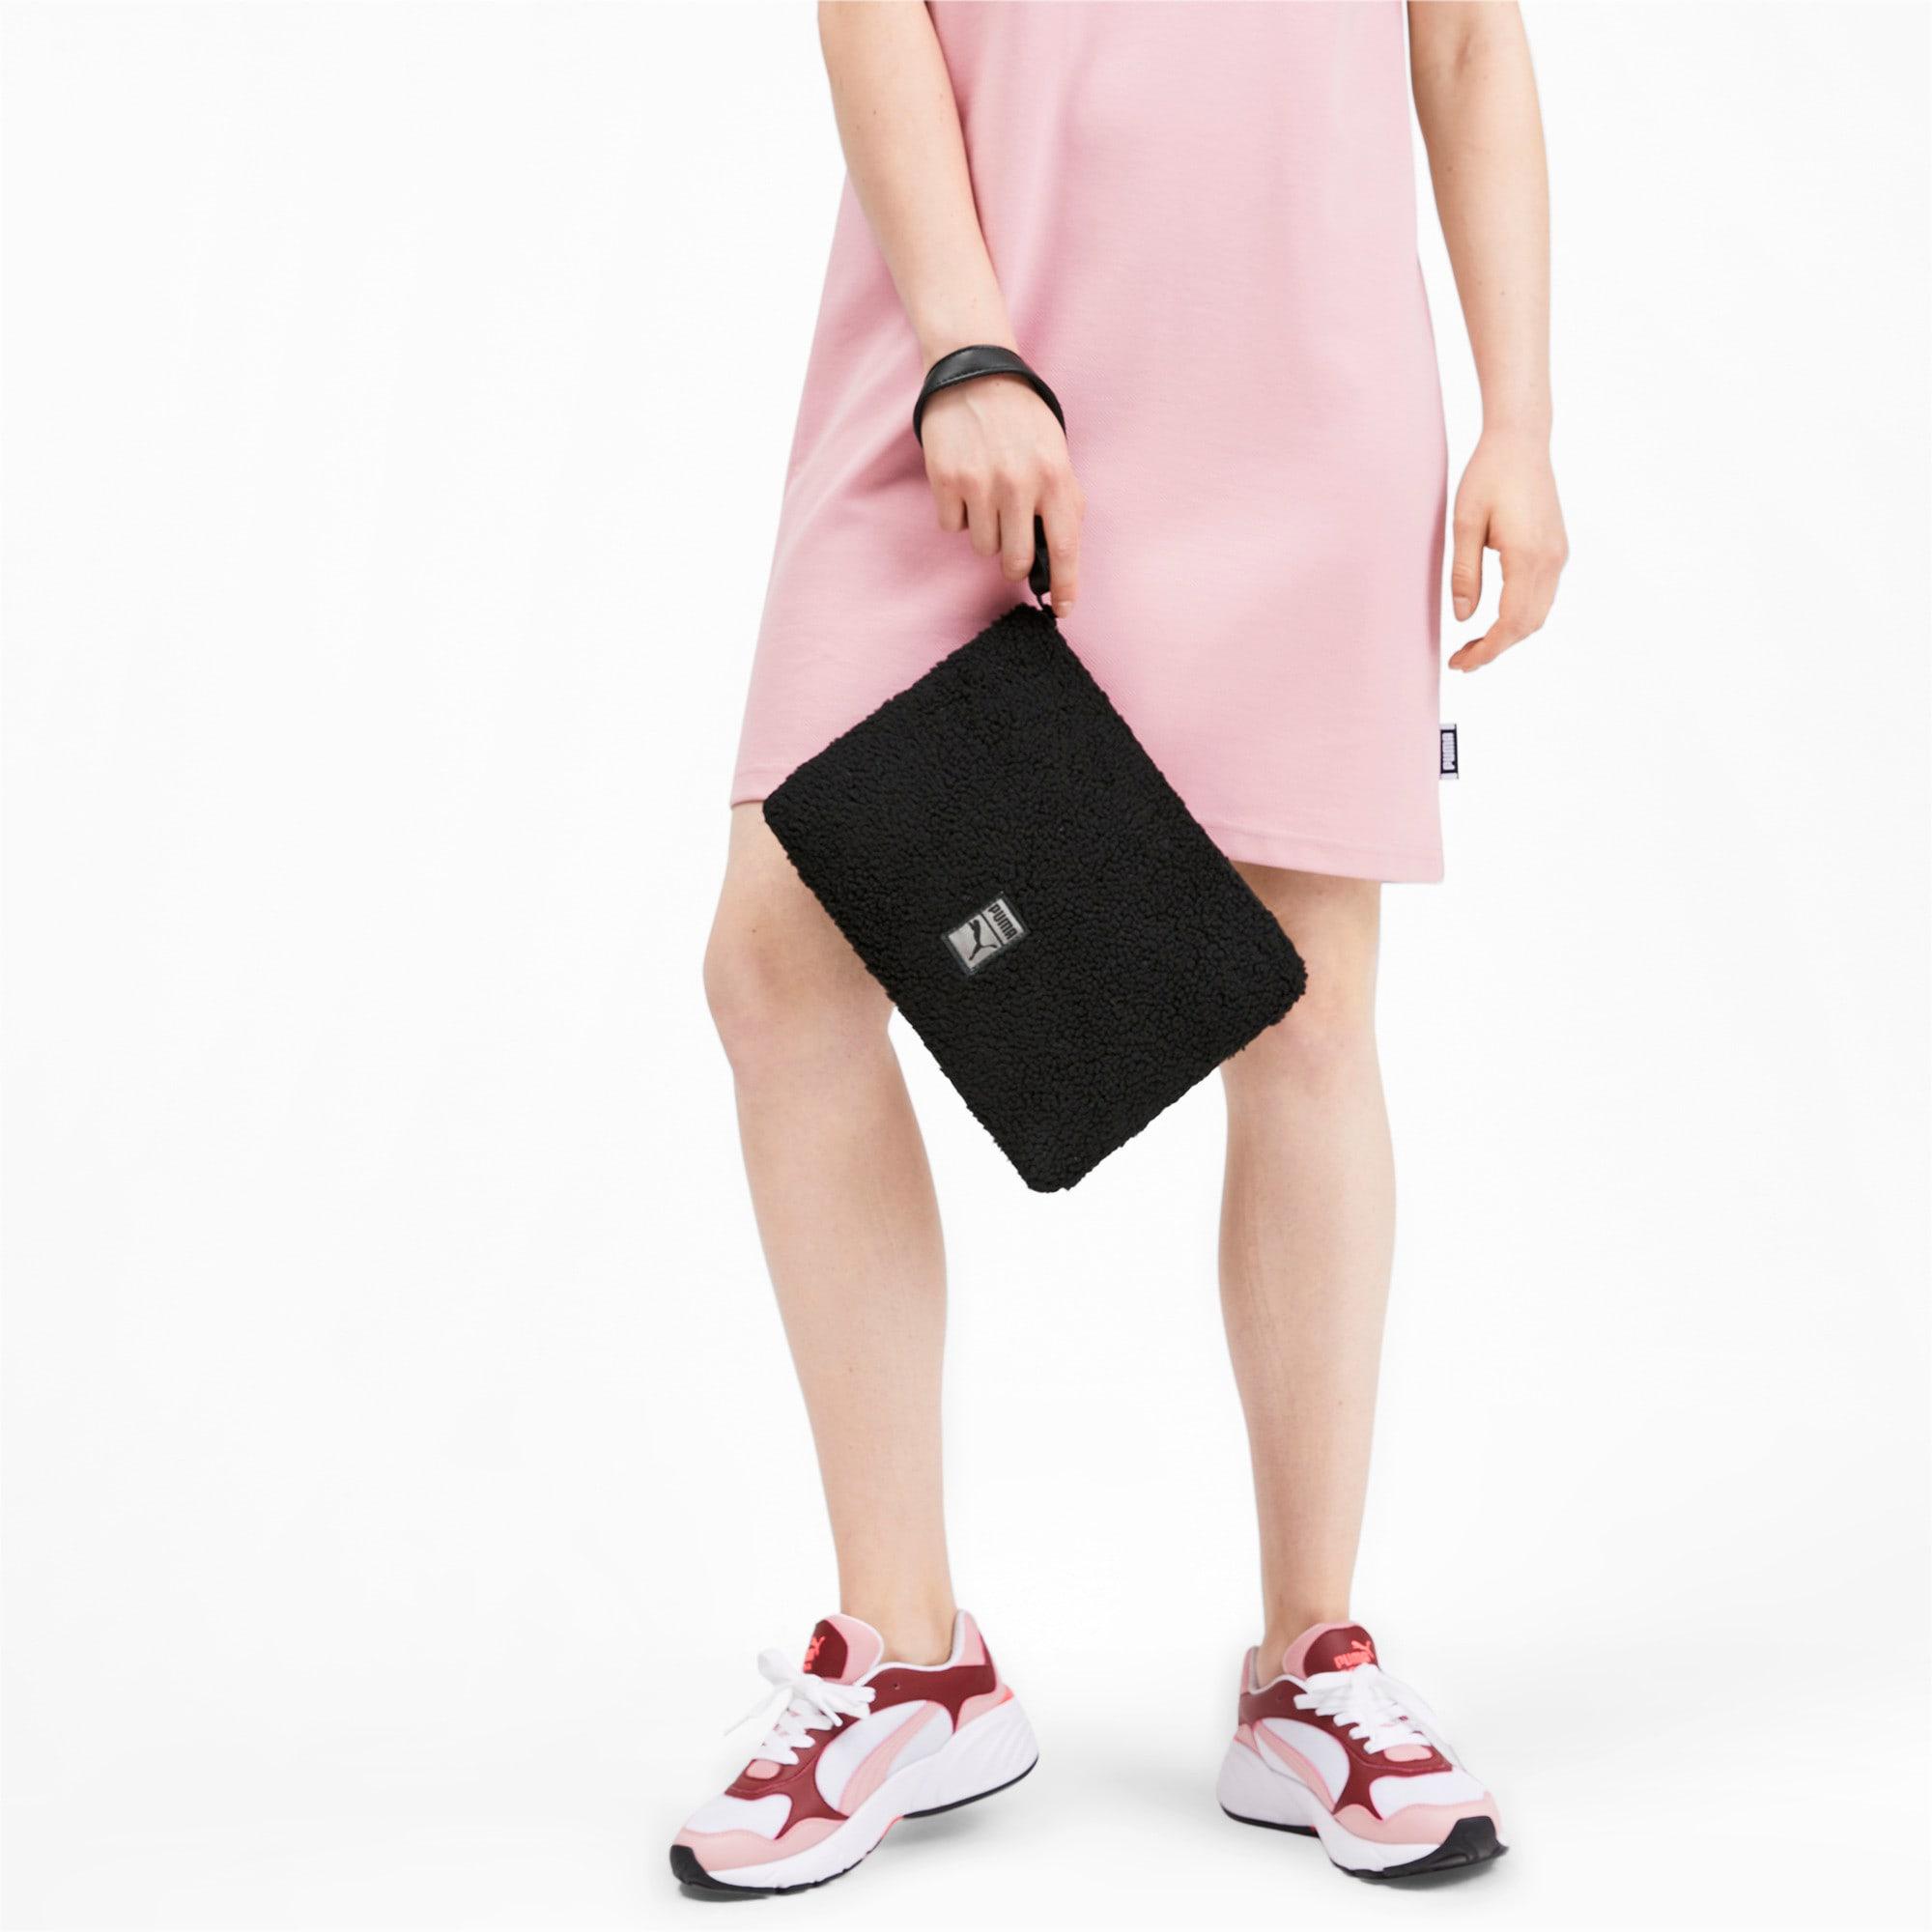 Thumbnail 2 of Prime Time Women's Clutch Bag, Puma Black-Puma Black, medium-IND